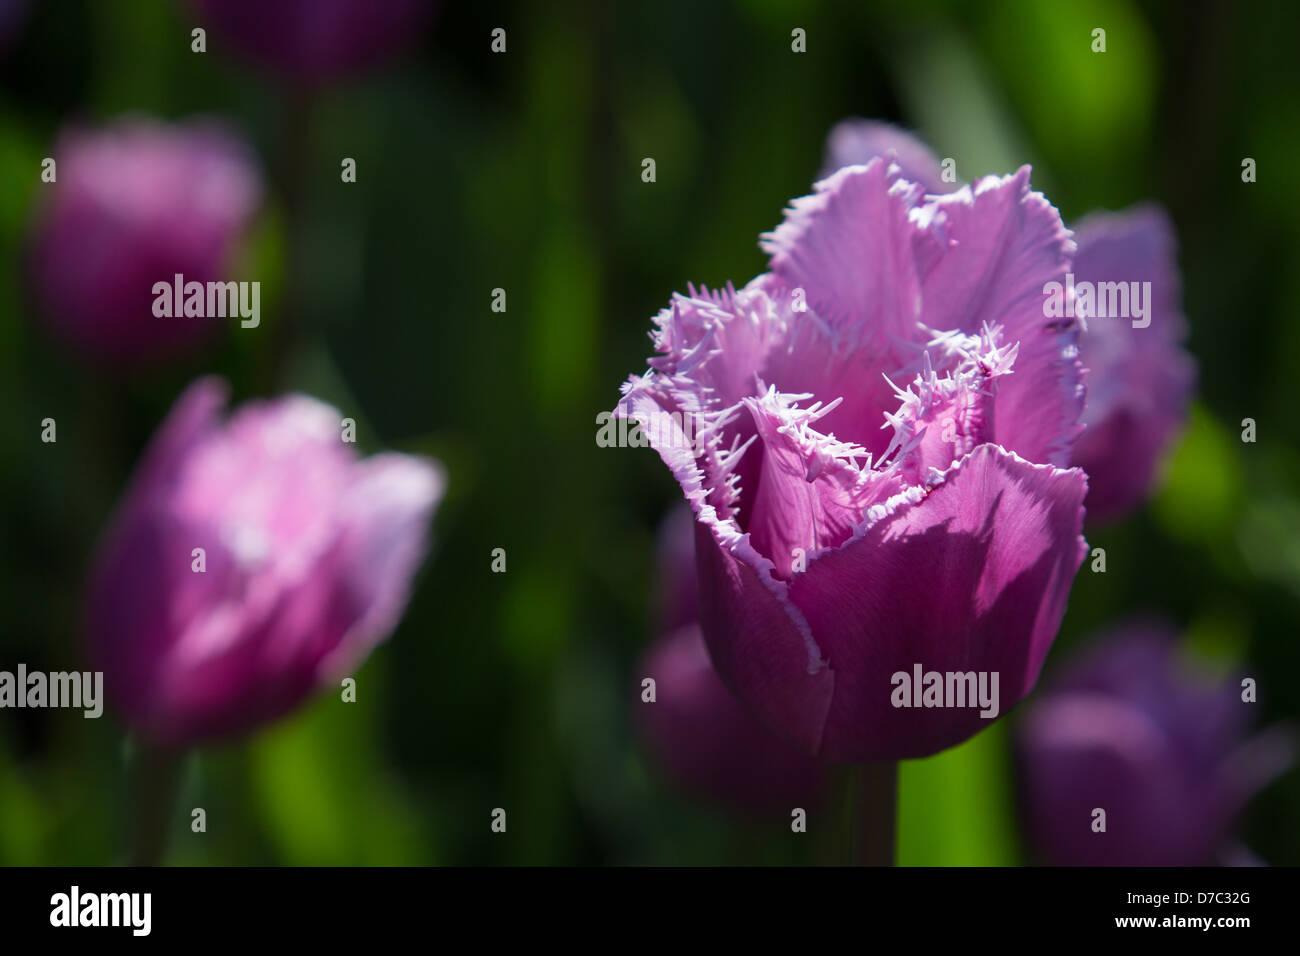 Purple 'Max Durand' Tulips at the Brooklyn Botanic Garden, New York, NY - Stock Image